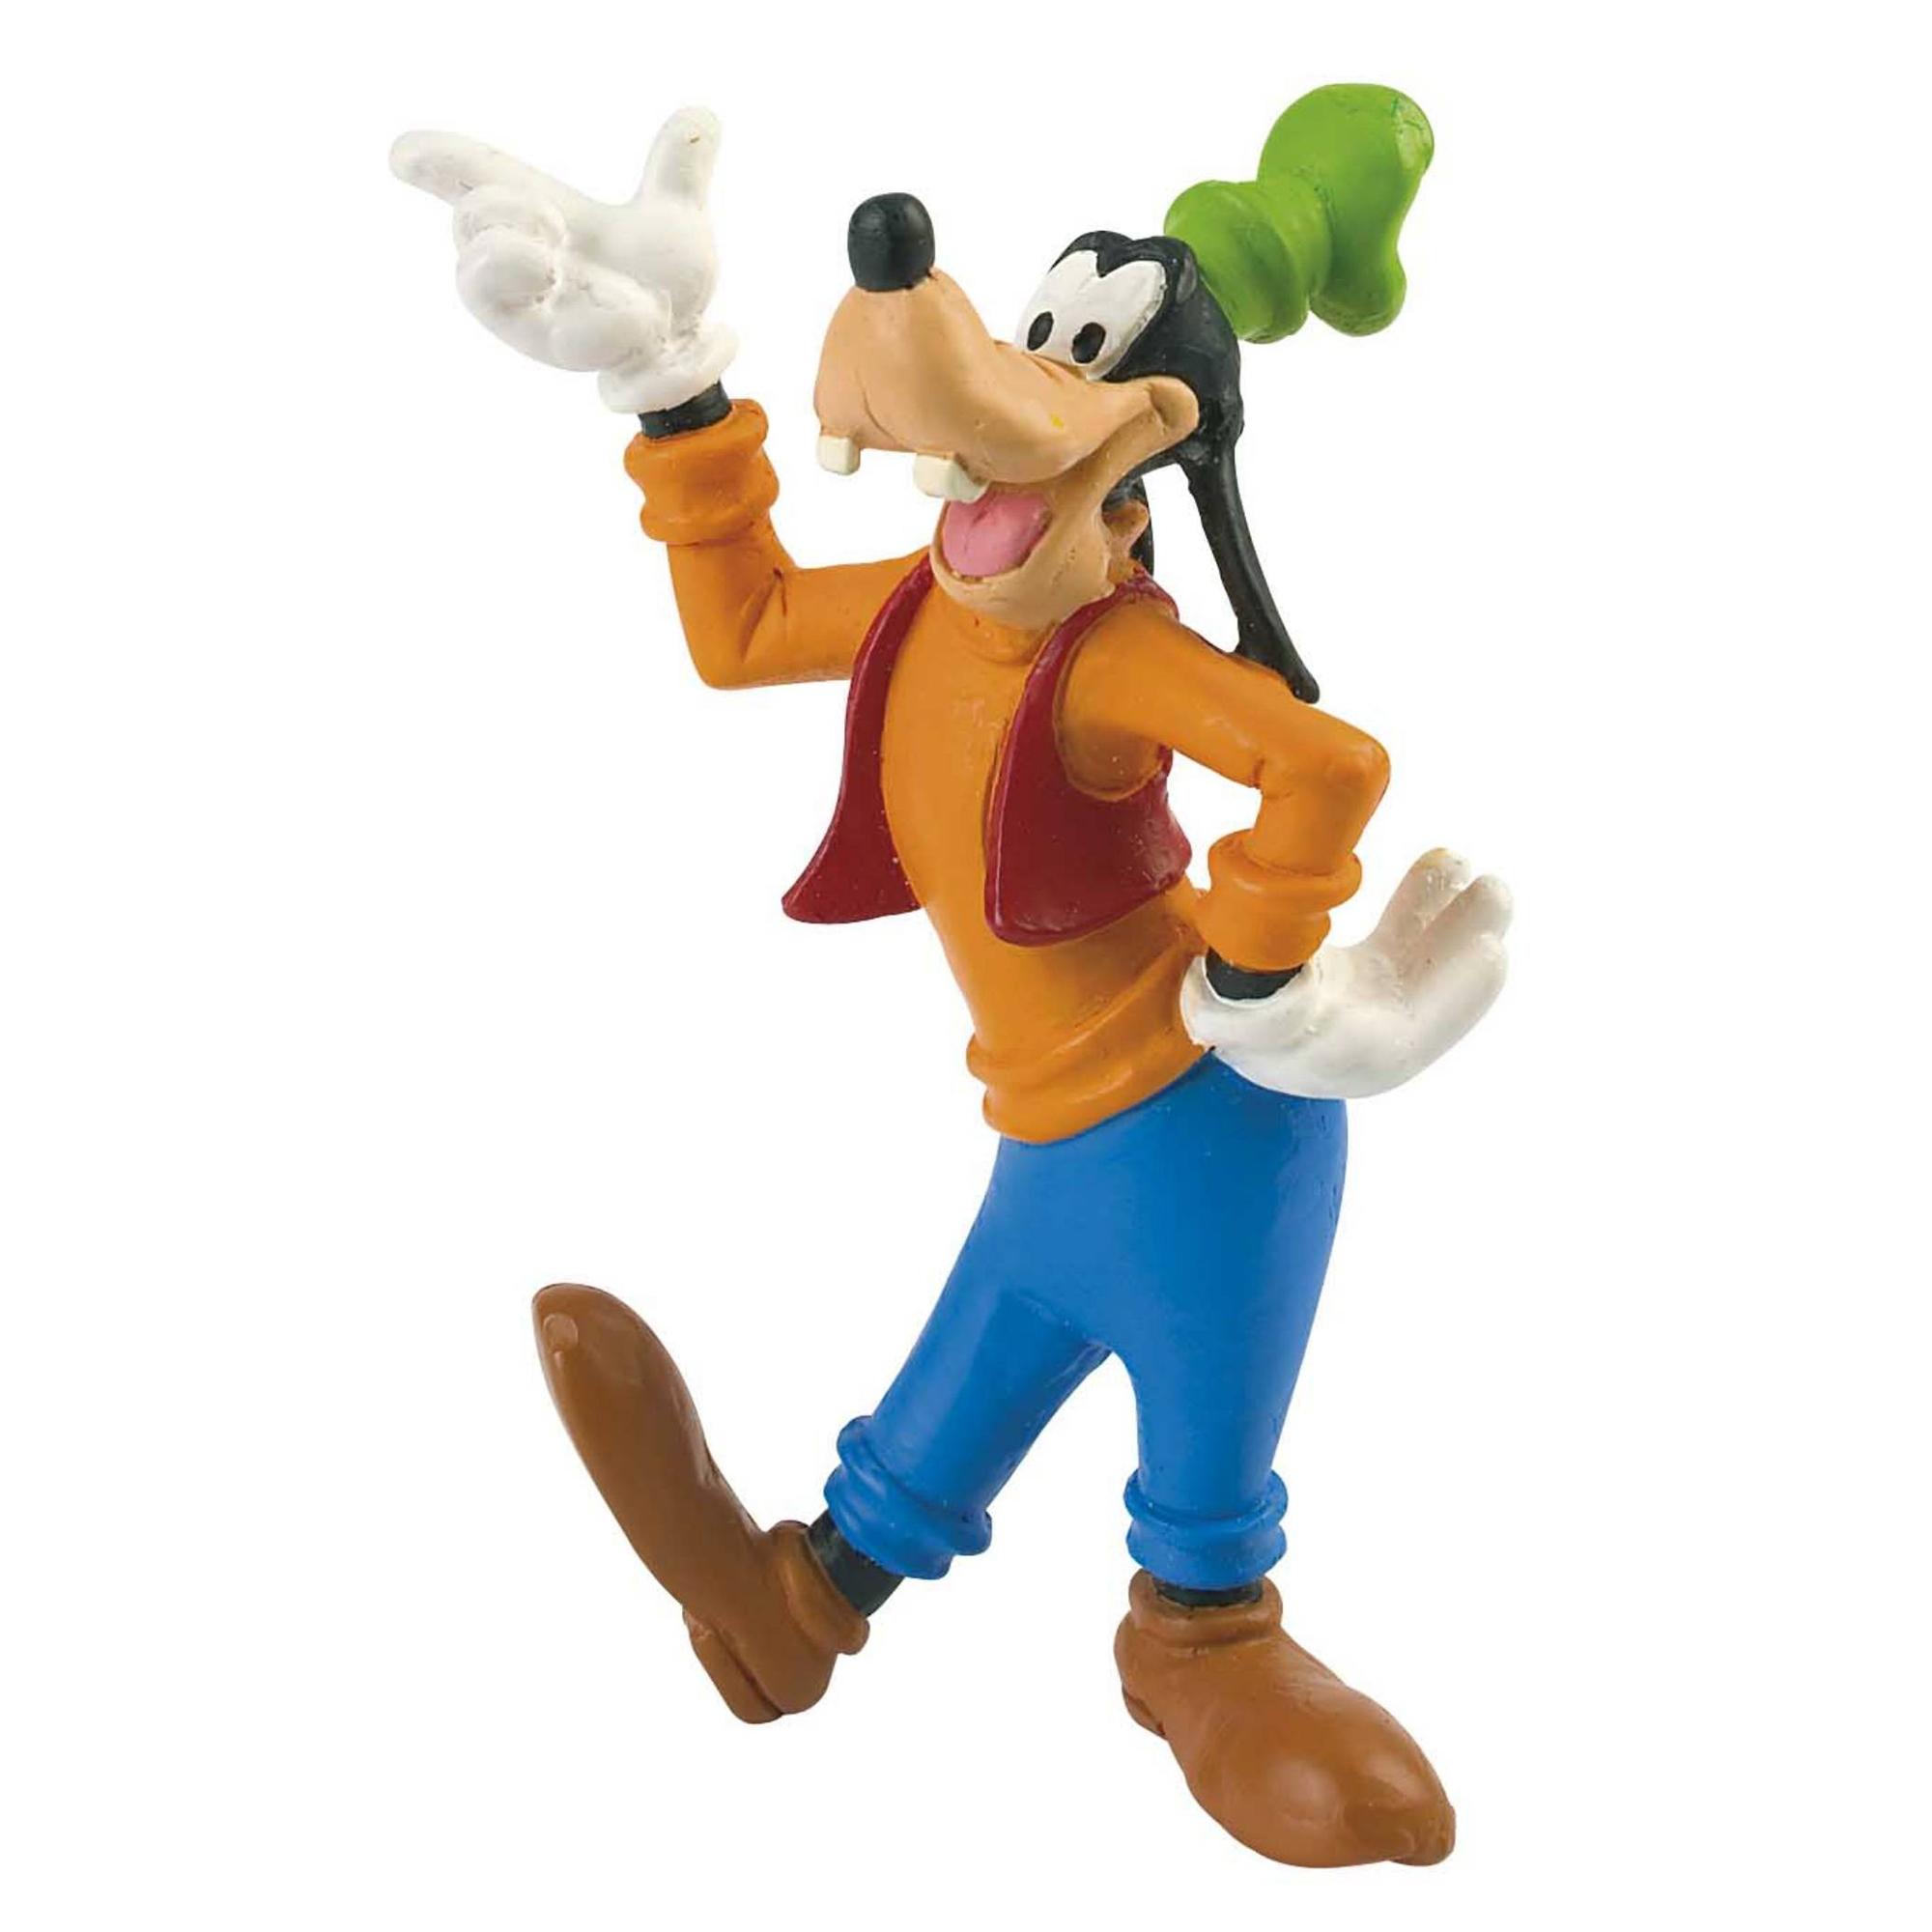 figurina goofy, 5 cm